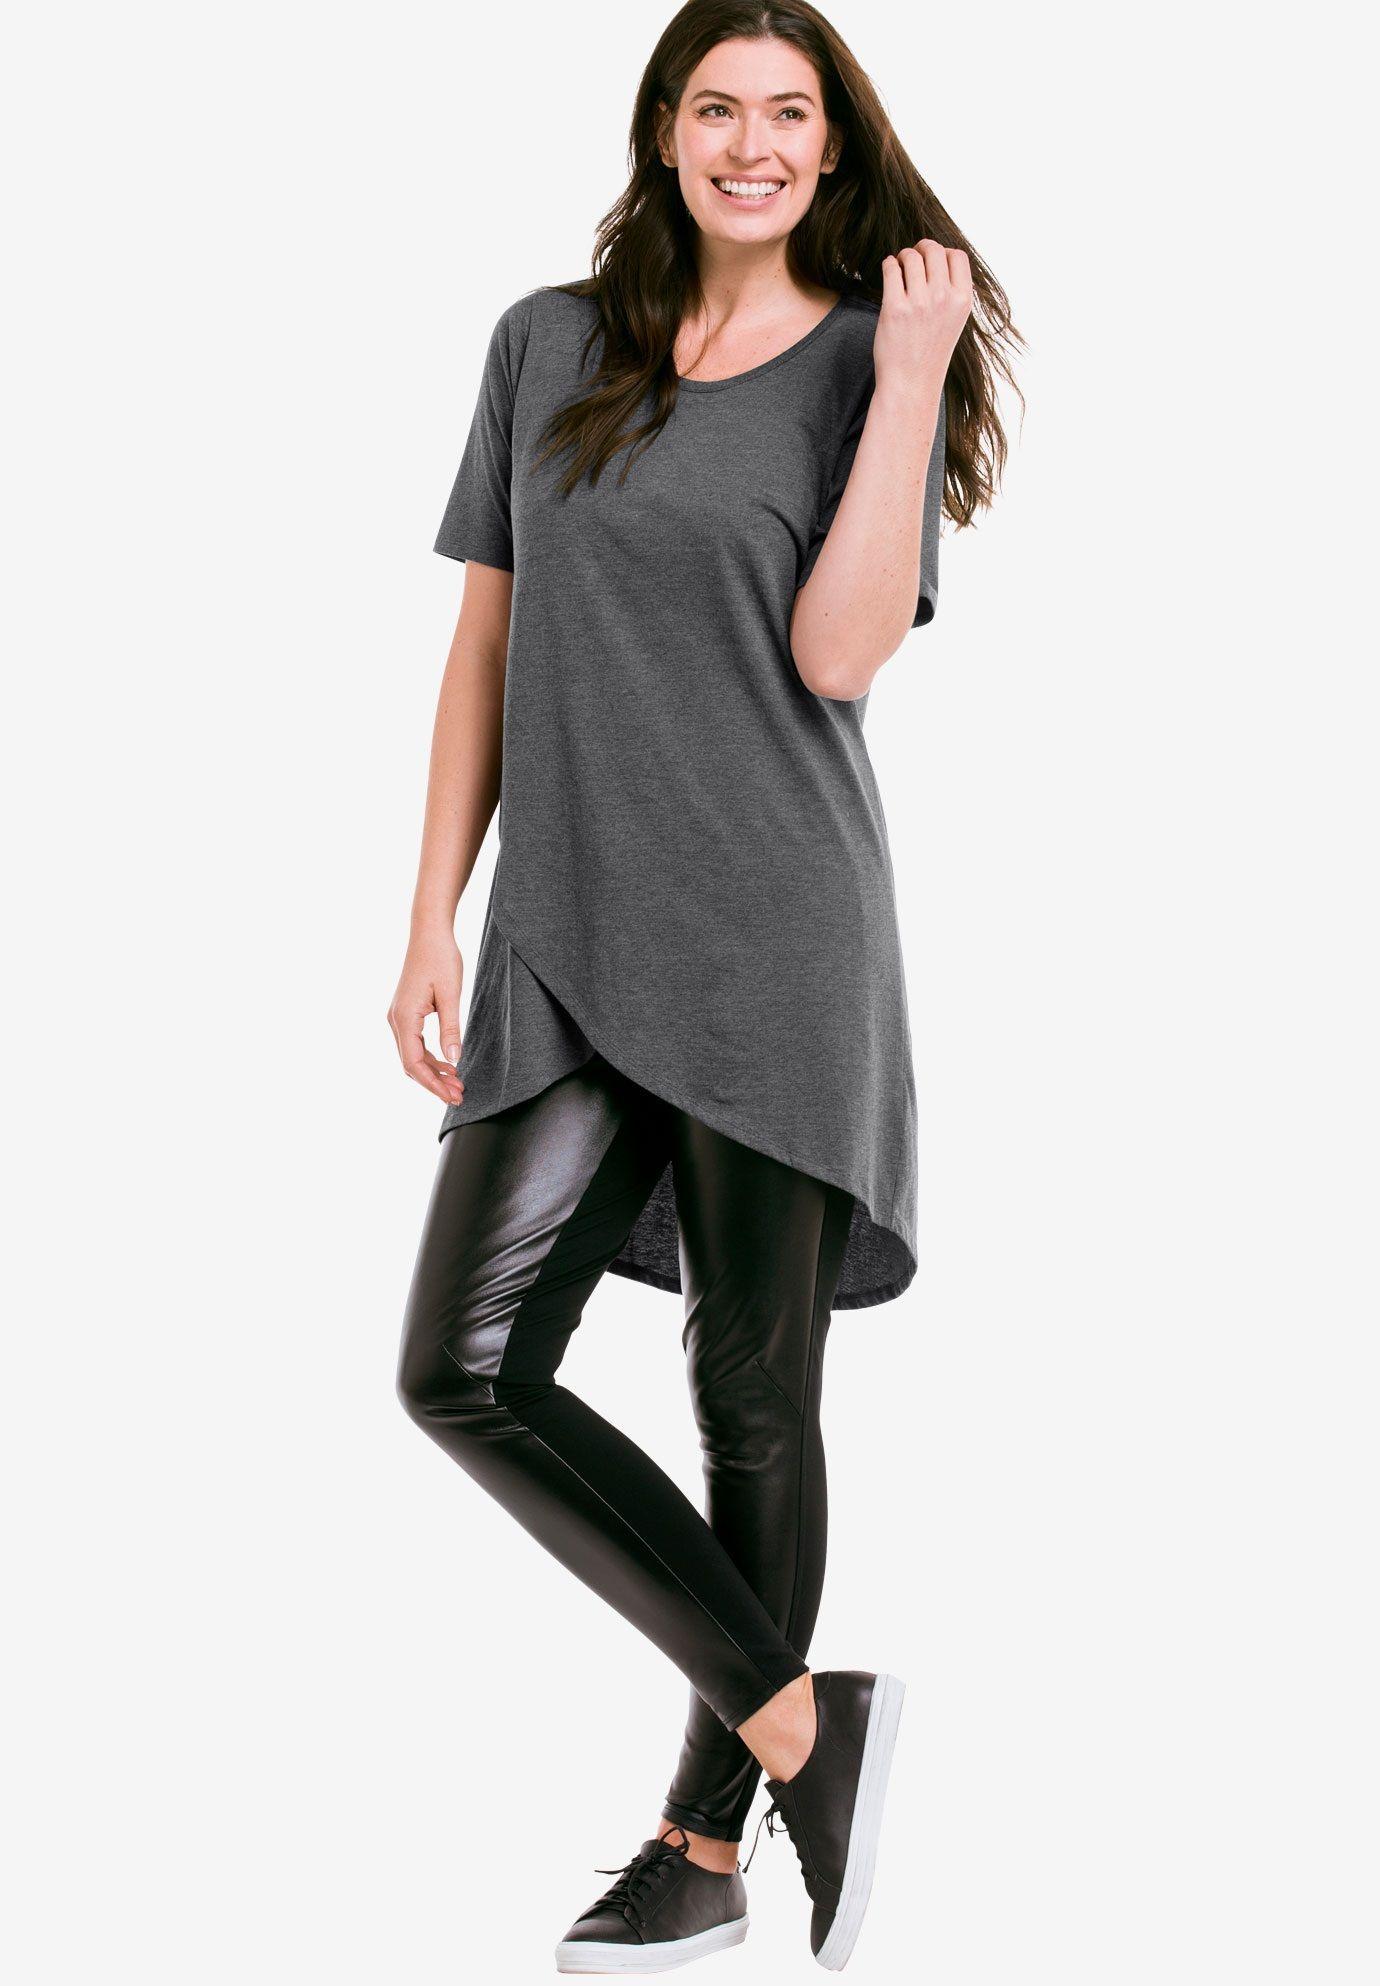 Vêtements Grande Taille · Tenues Grande Taille · Tulipes · Tulip Hem Tunic  by ellos - Women s Plus Size Clothing Minimaliste Chic, Mode De Femmes dbff32958015